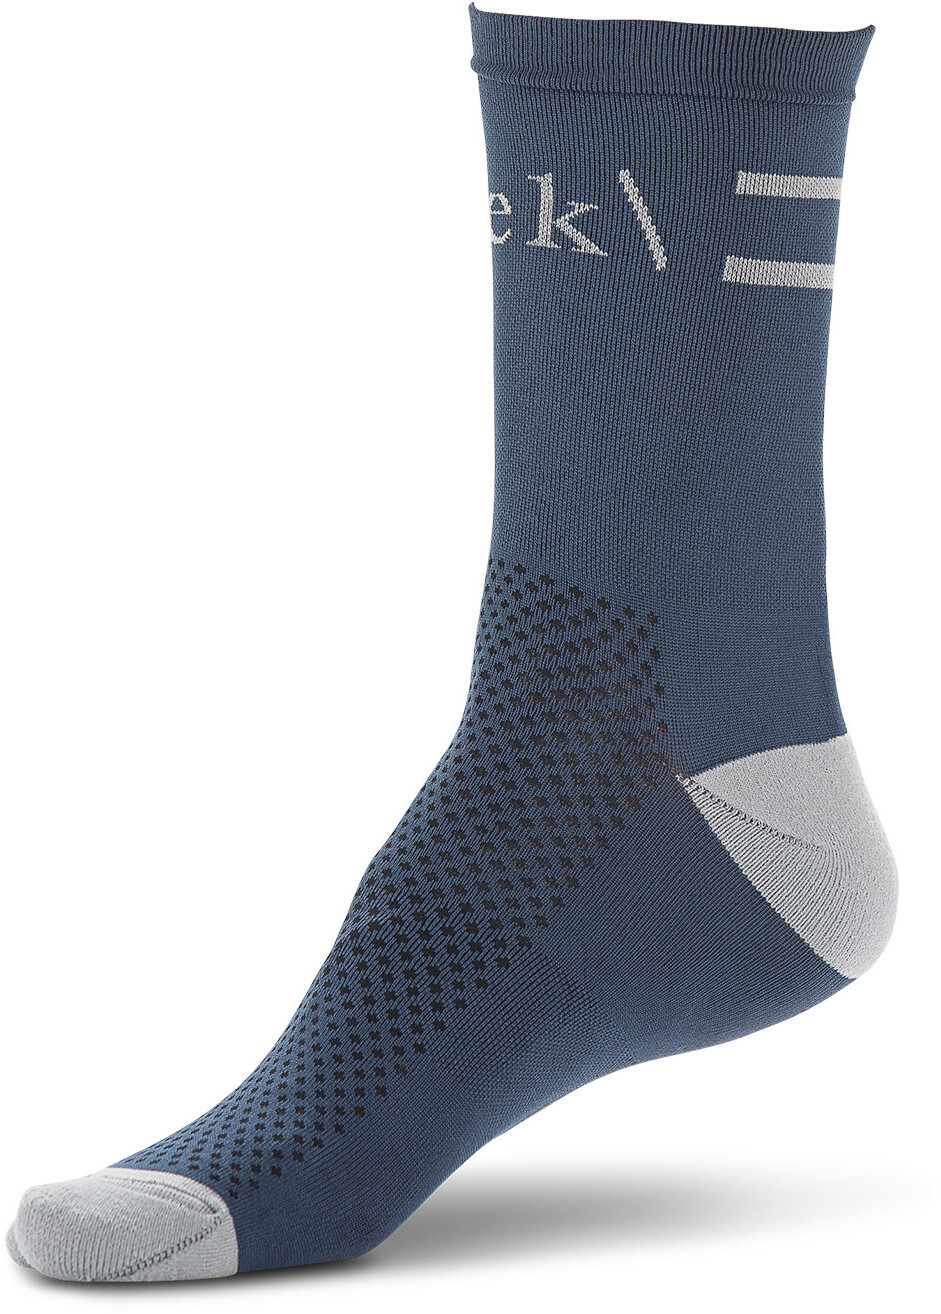 RYKE Mid Cut Strømper, blue (2020) | Socks